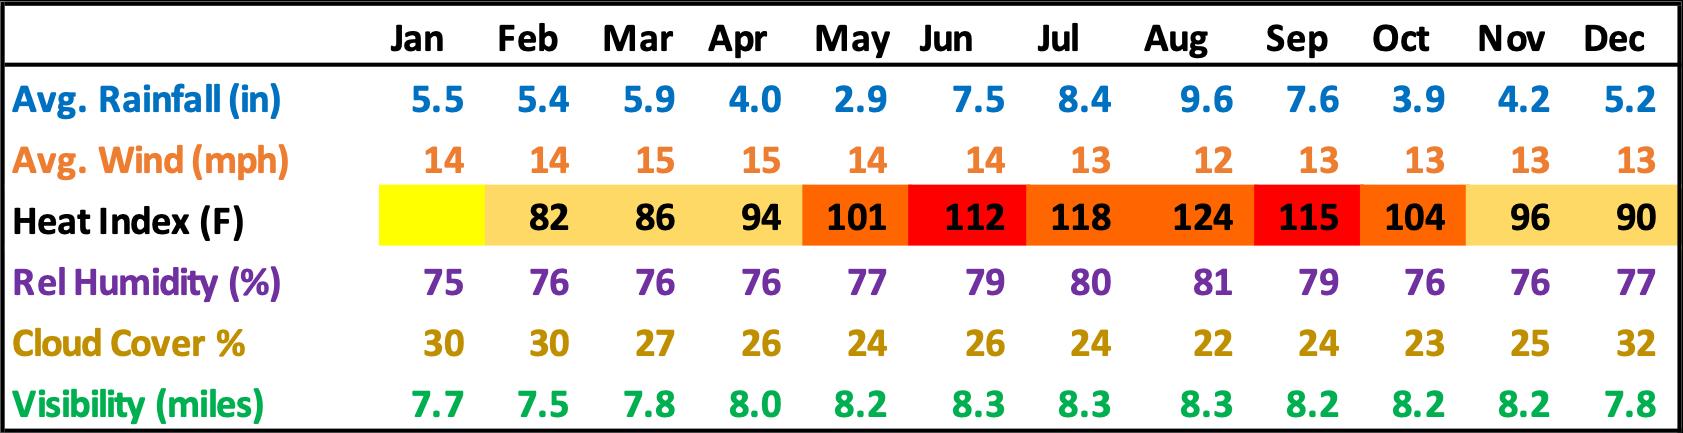 Port St. Joe Florida Average Rainfall Wind Humidity Clouds Visibility Chart